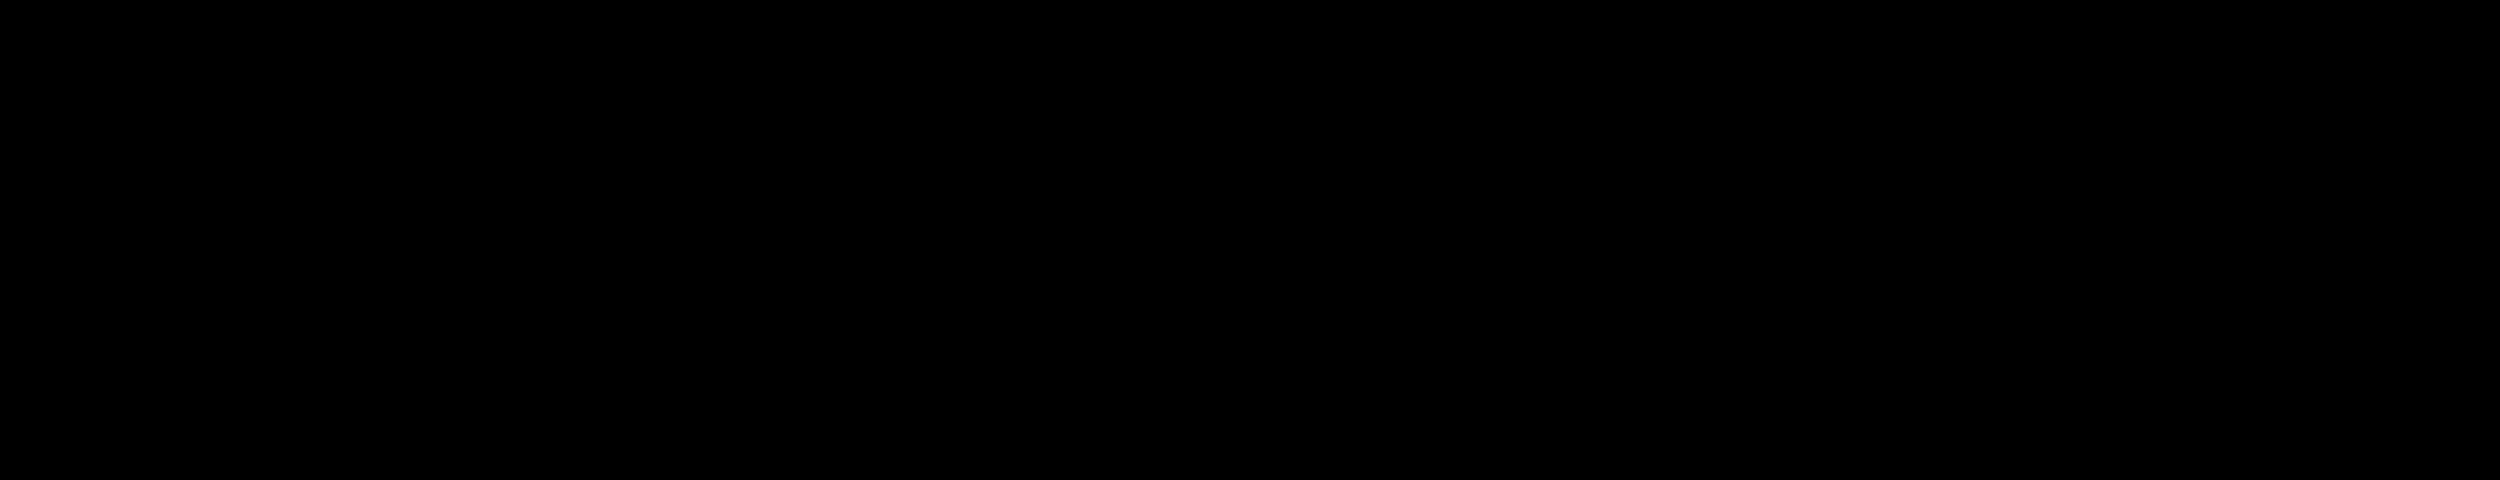 KAMISM-logo.png